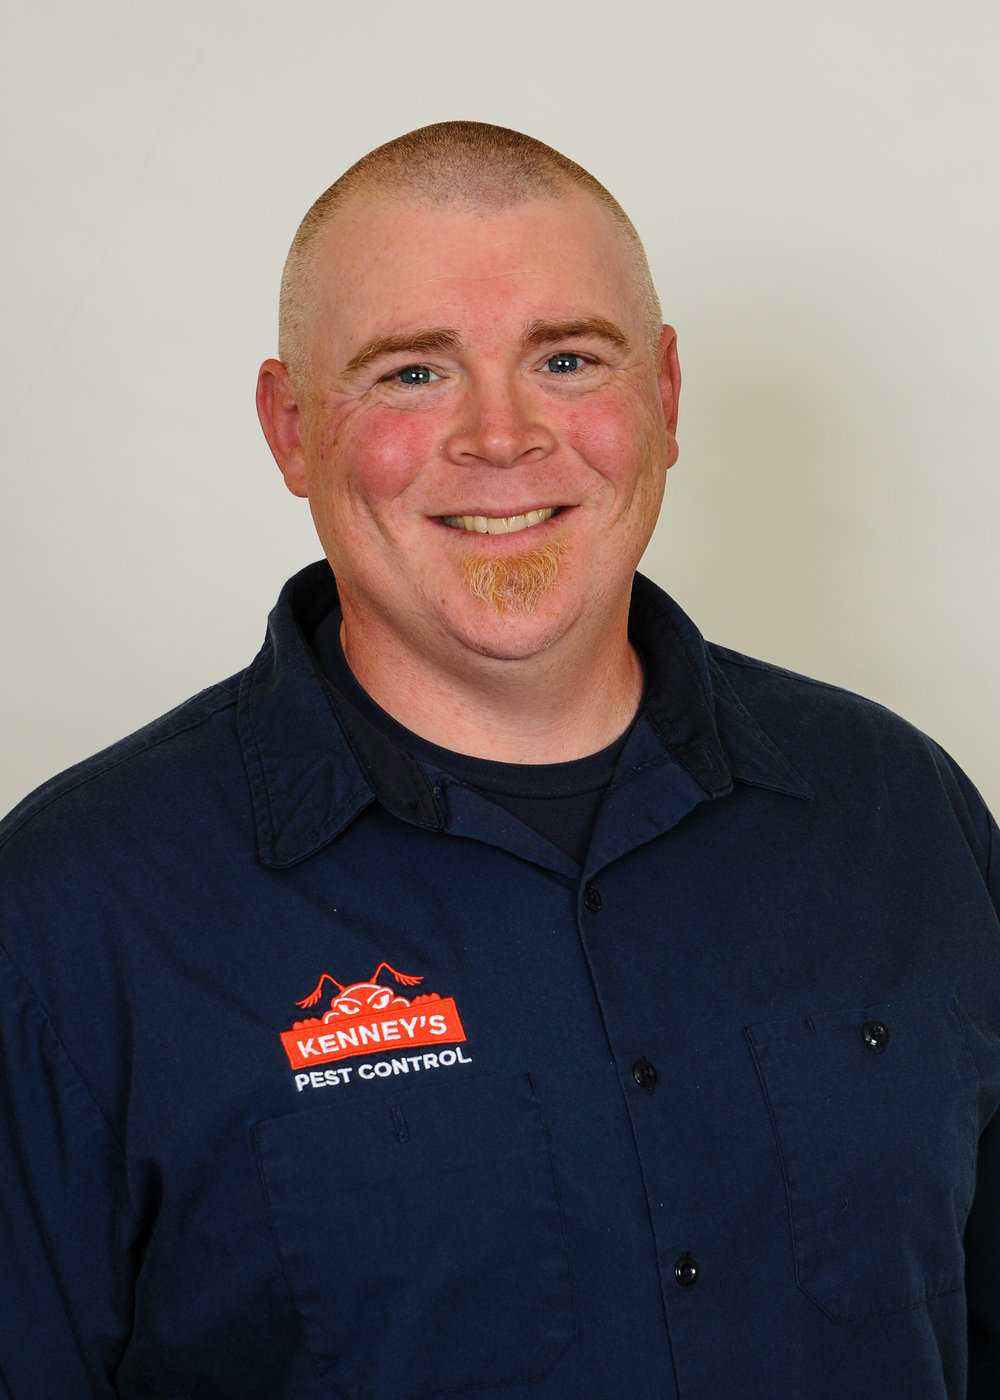 Josiah Campbell - Certified Technician